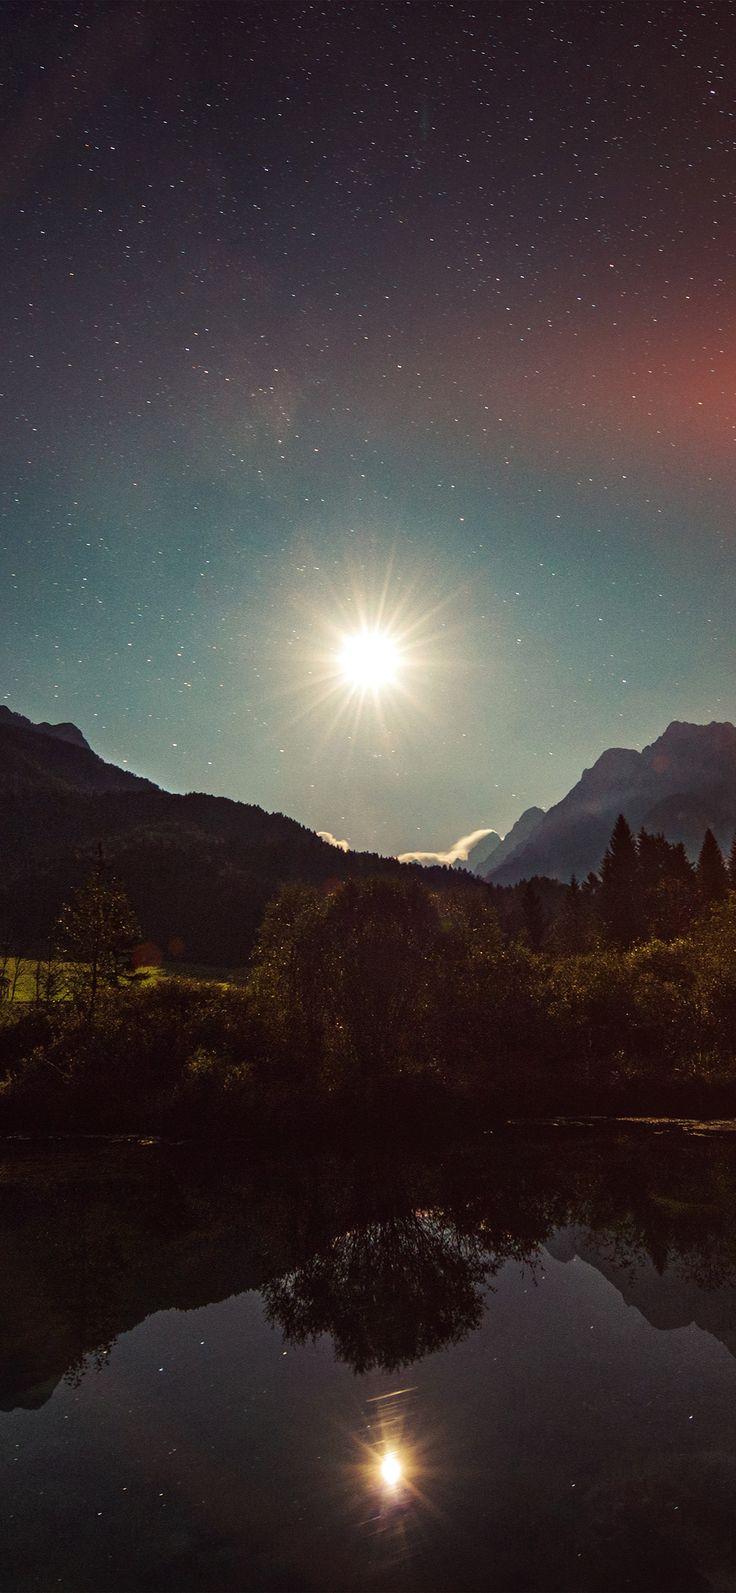 Iphone X Wallpaper Nc01 Sunshine Day Dream Nature Mountain Lake